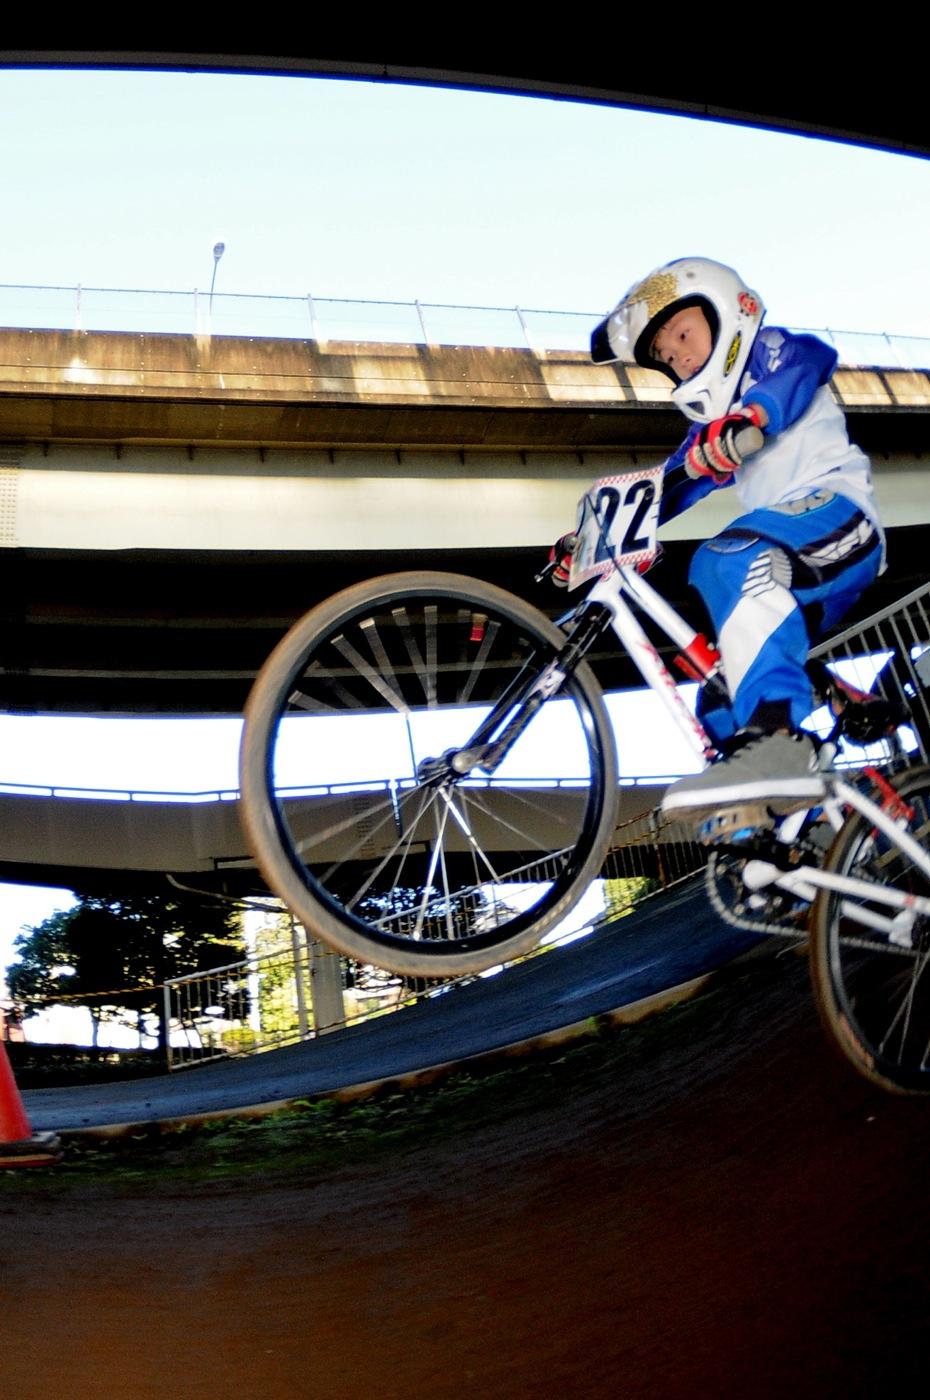 2009JOSF川口ゴリラ公園12月定期戦VOL9:コース外の風景..._b0065730_20484473.jpg